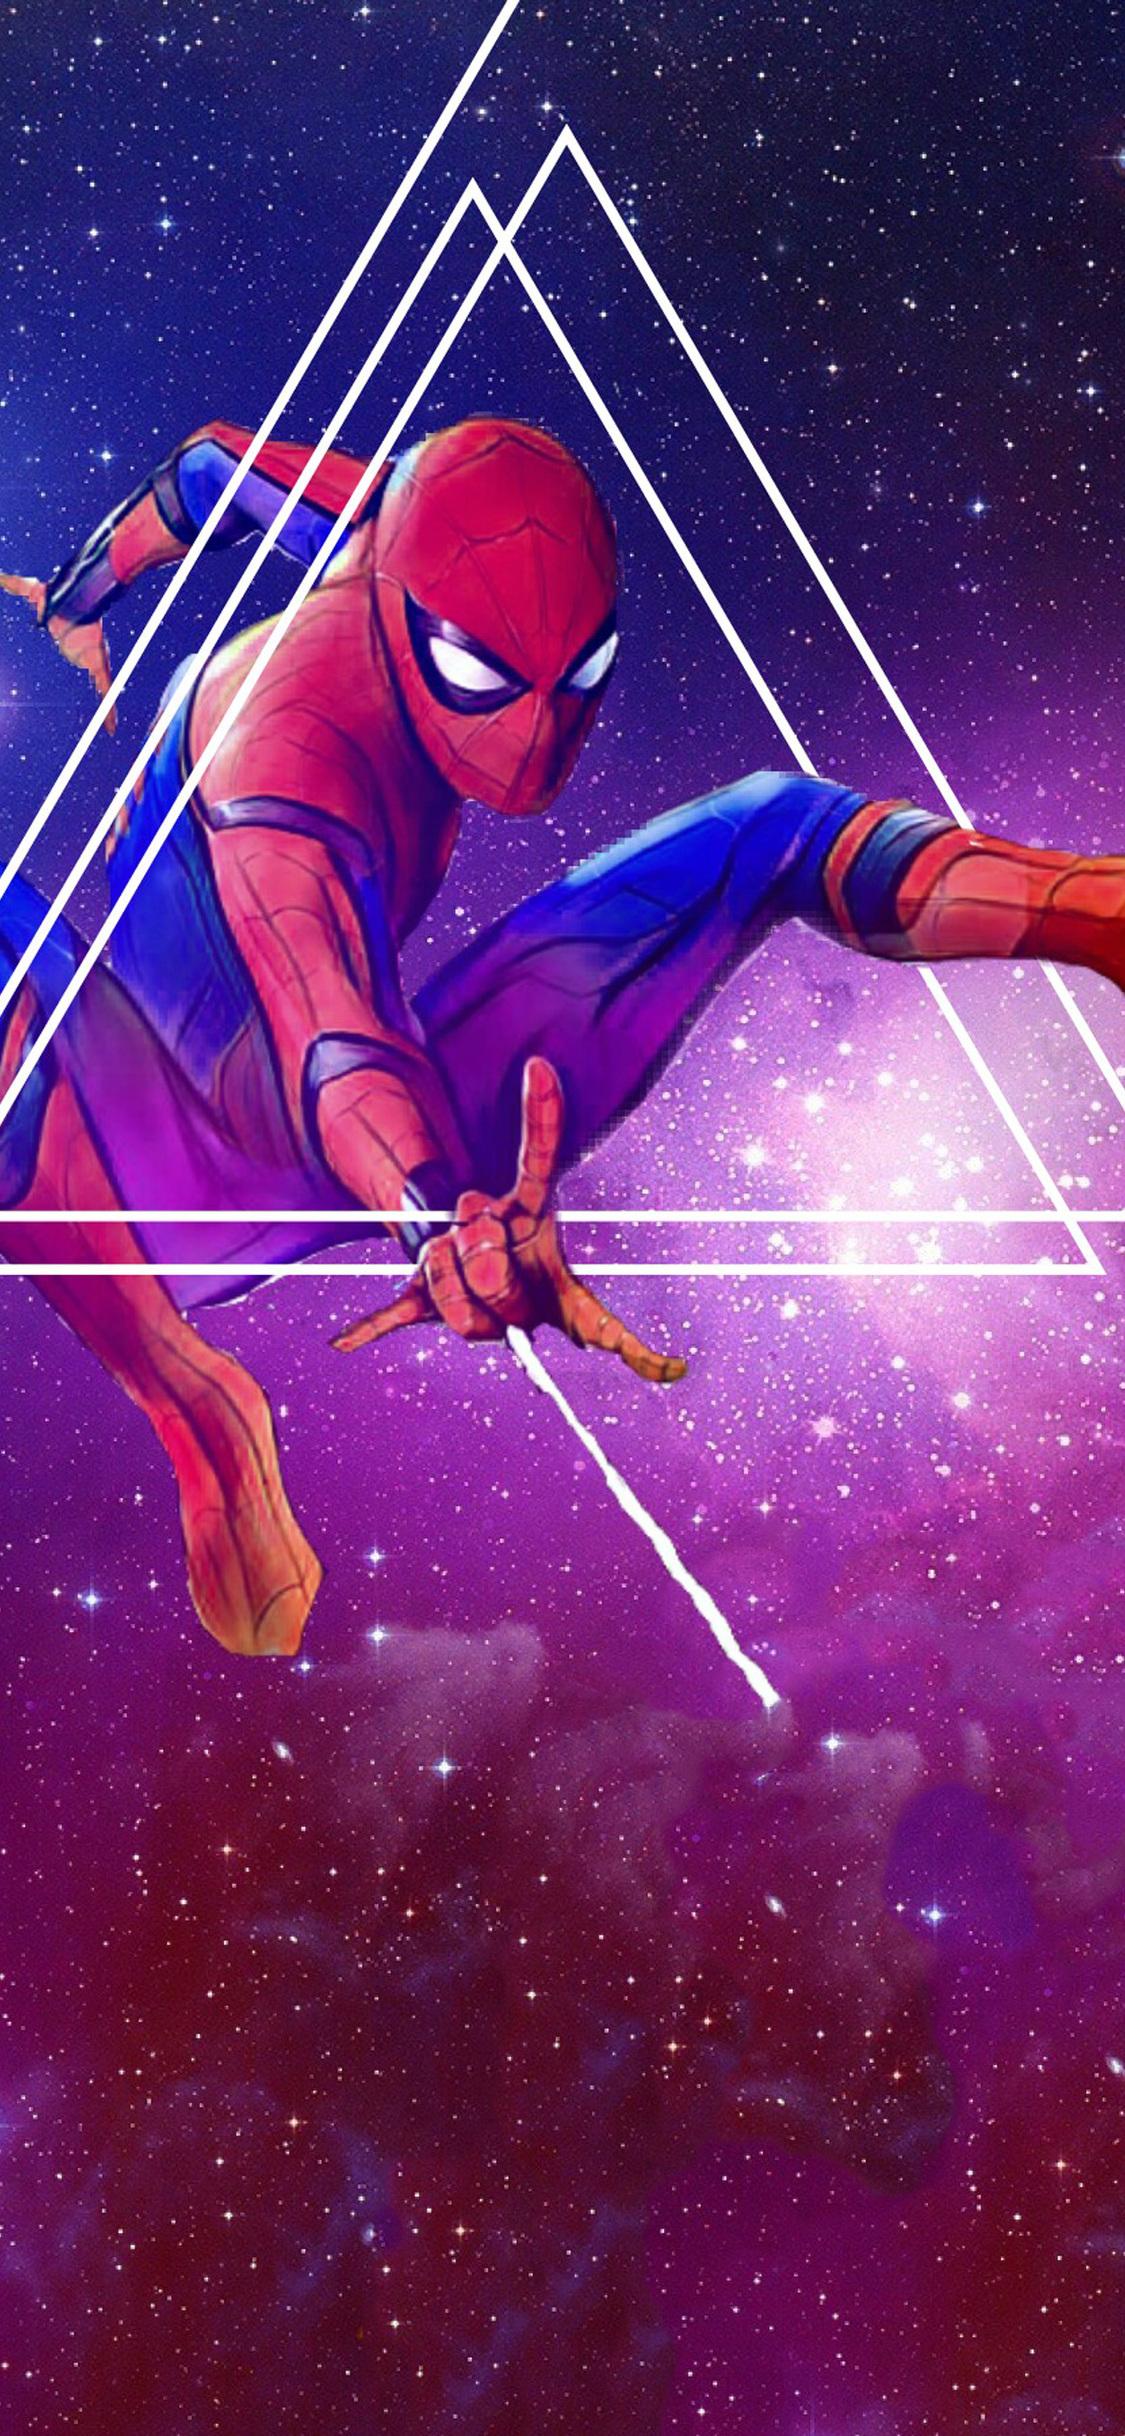 1125x2436 spiderman avengers infinity war artwork iphone - Avengers infinity war wallpaper iphone ...